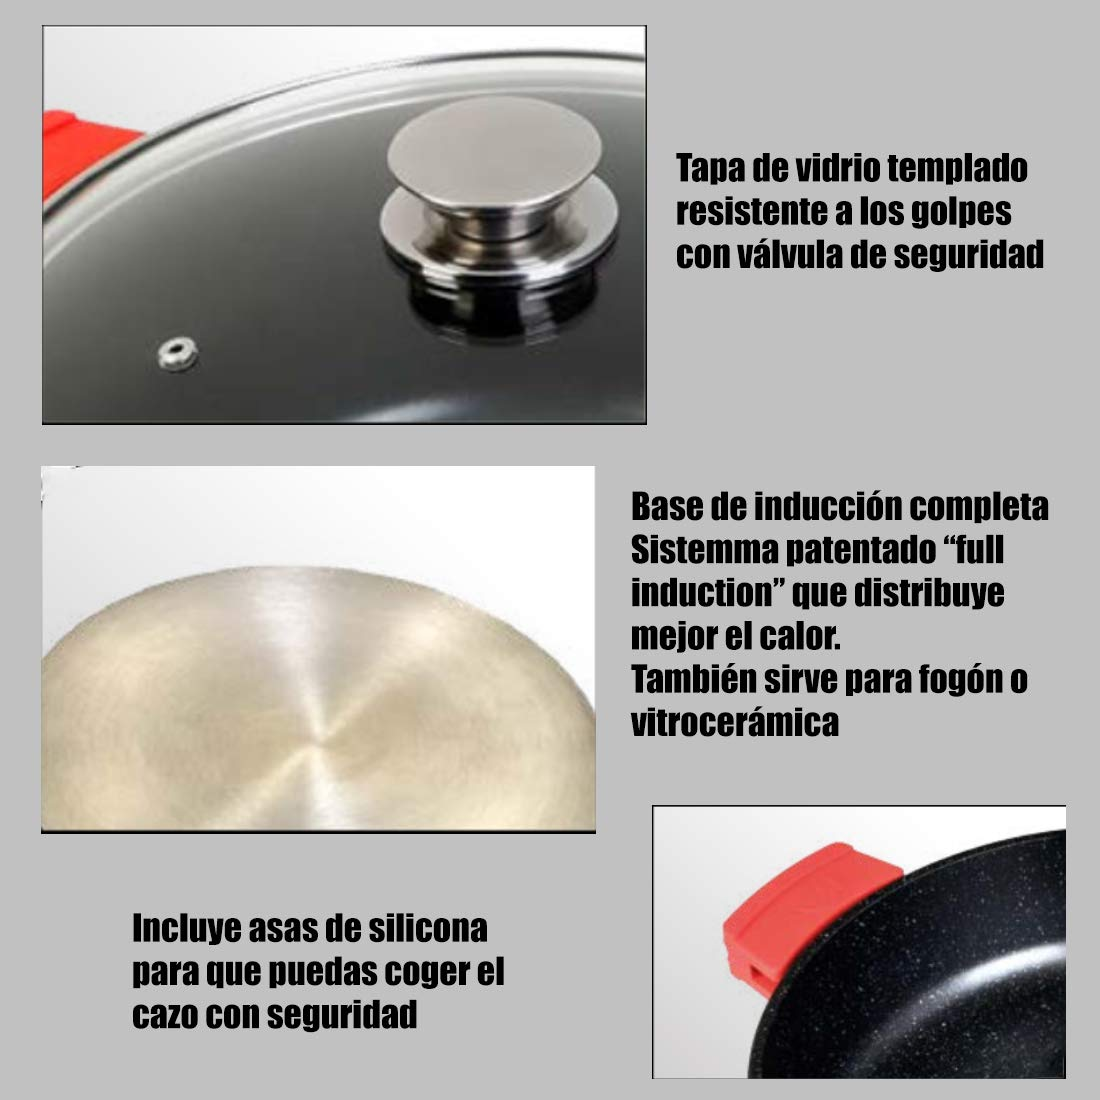 WeCook 10137 Cazuela de Cocina Inducción Profesional Grande, Tapa de Cristal, Cacerola Antiadherente, Libre de BPA, 36 cm, Aluminio Forjado